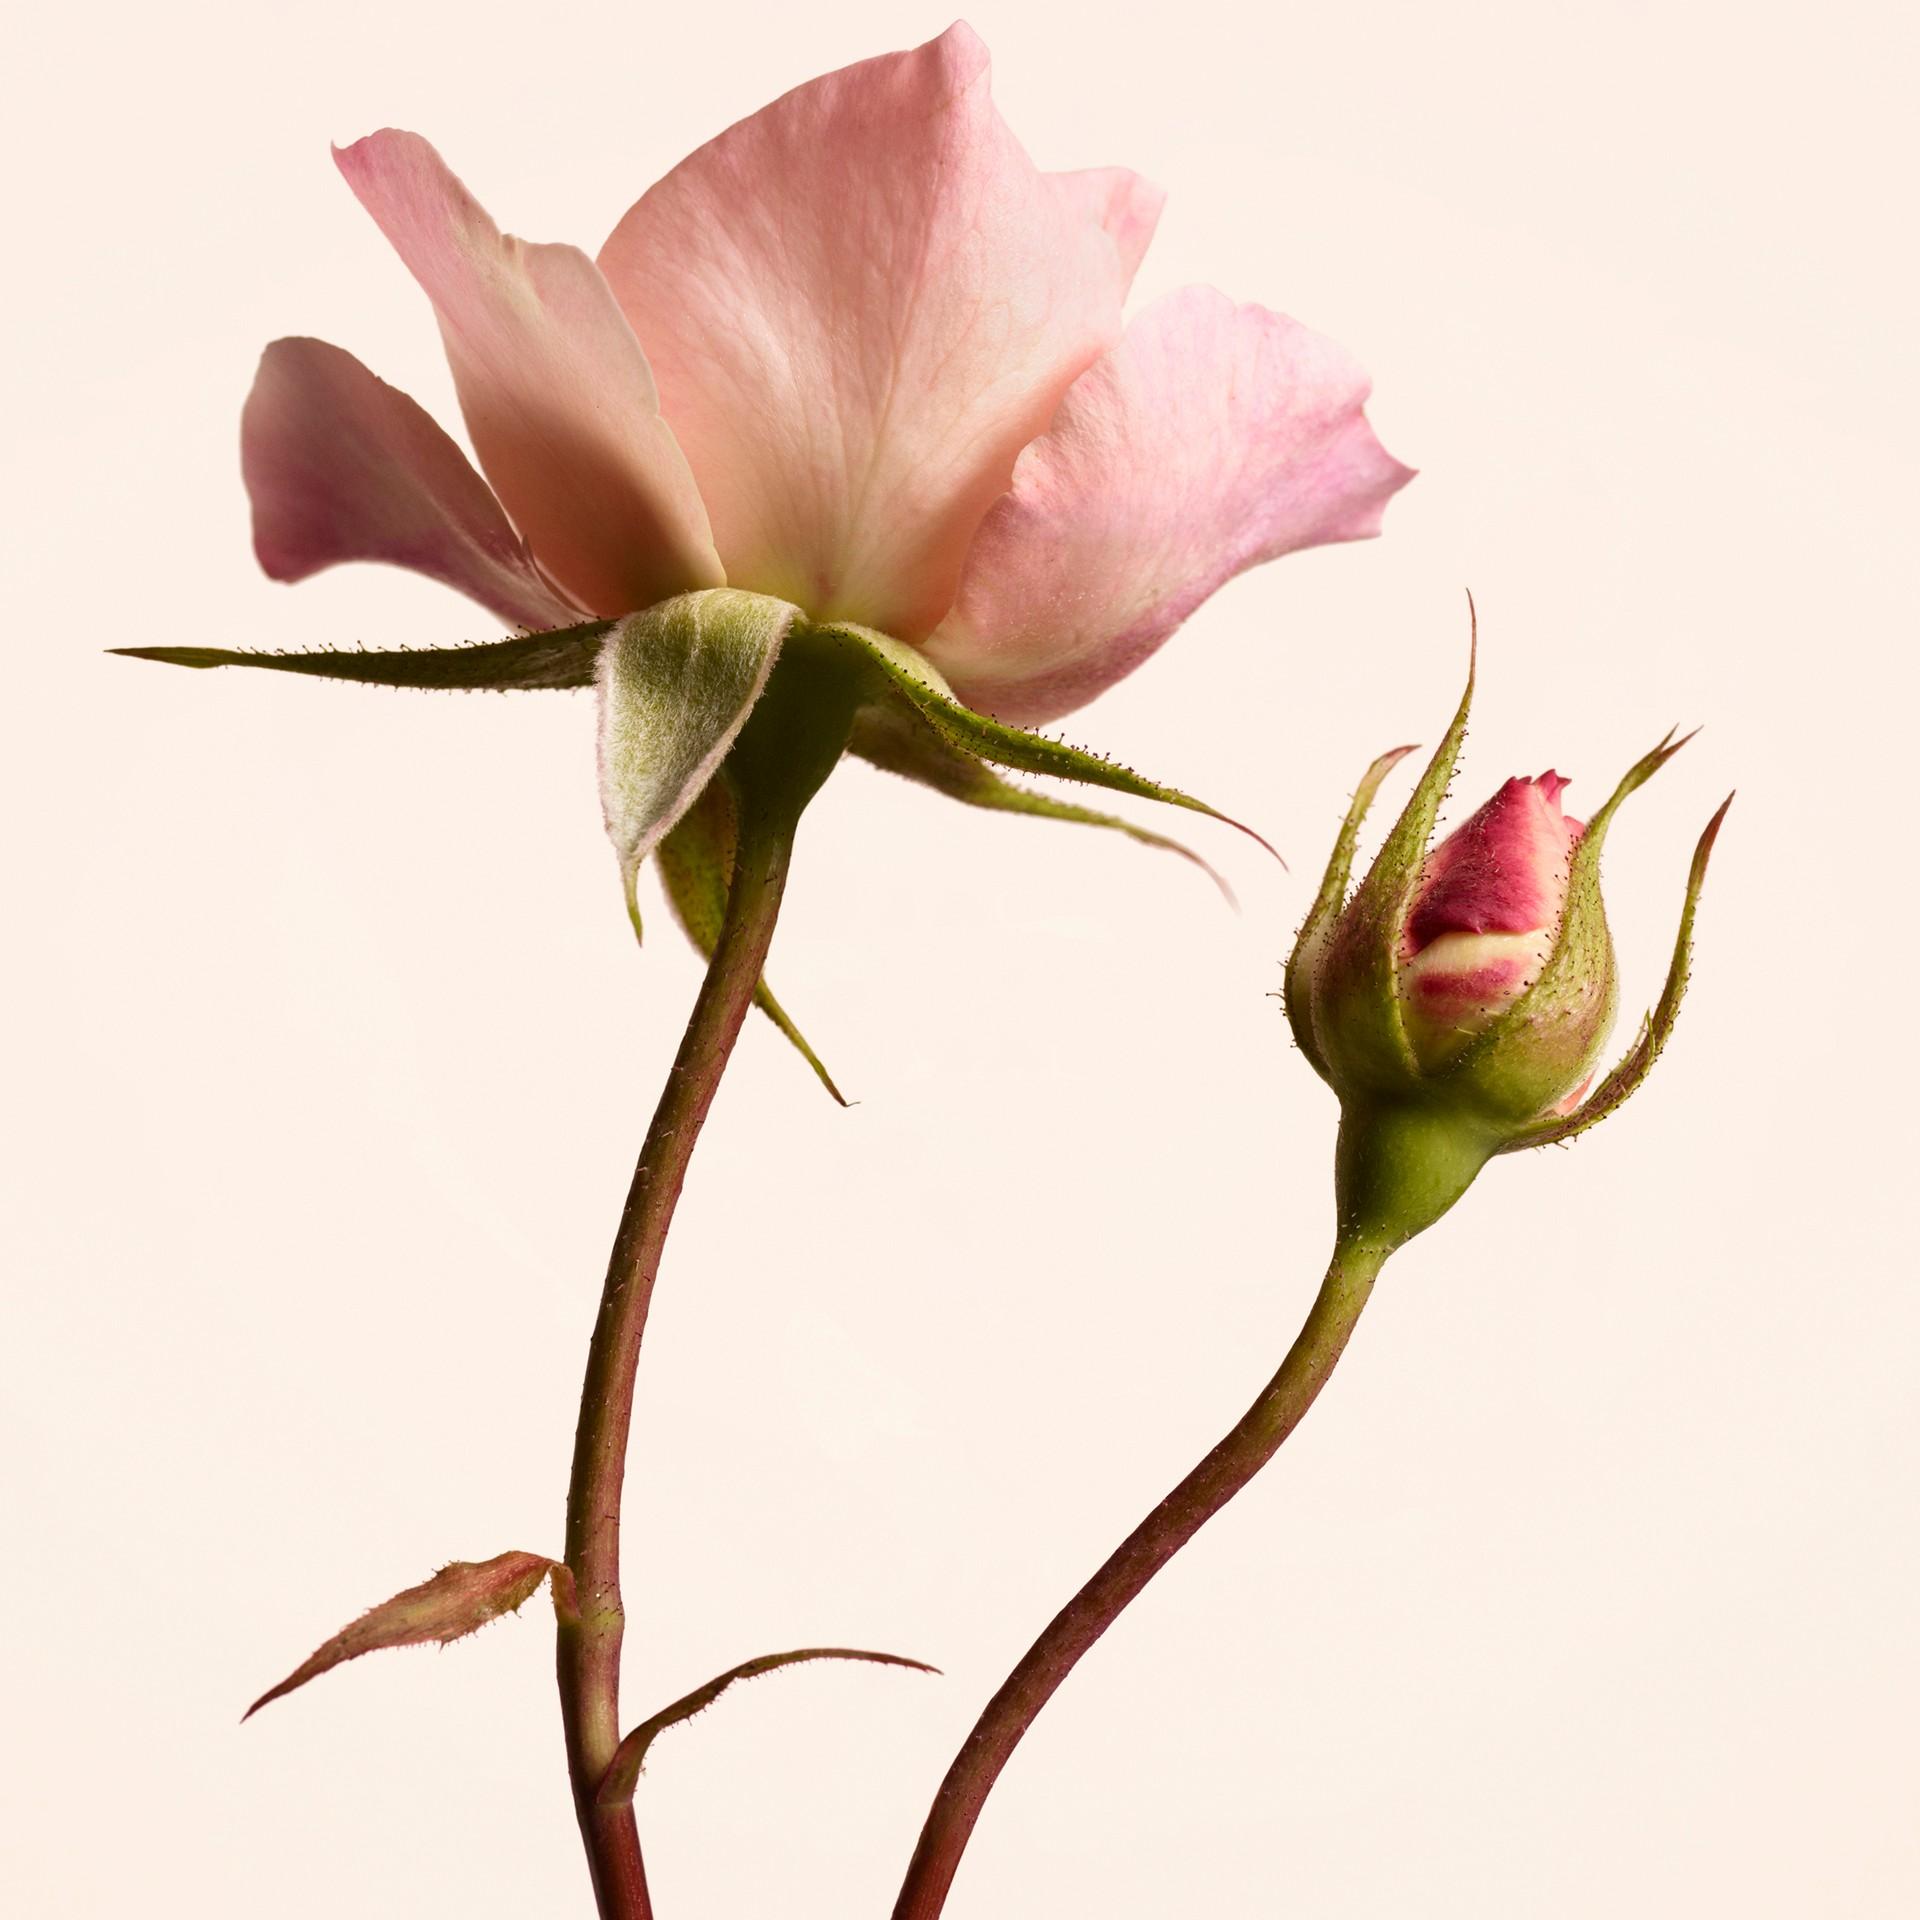 Burberry Signatures Garden Roses Eau de Parfum 100ml | Burberry United States - gallery image 2